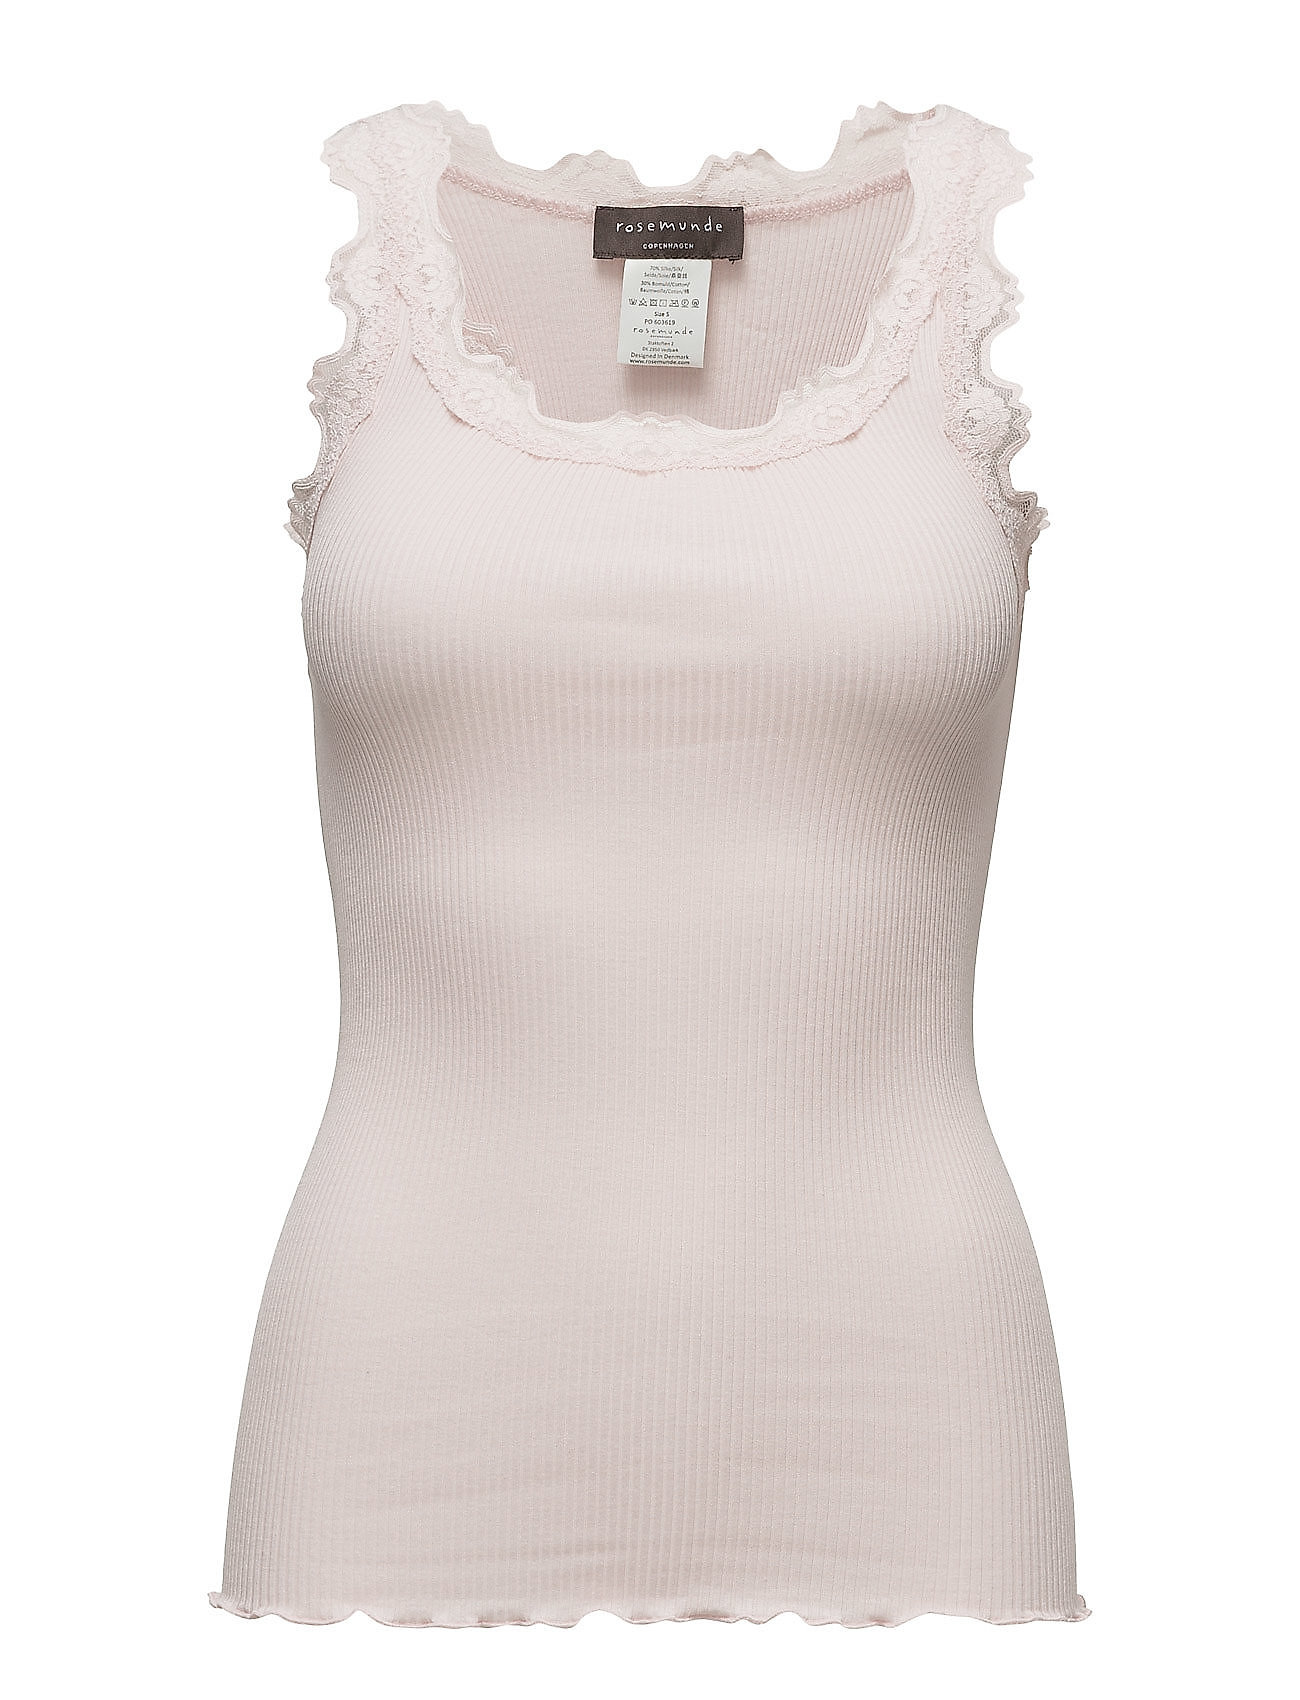 Rosemunde Silk top regular w/vintage lace - SOFT ROSE